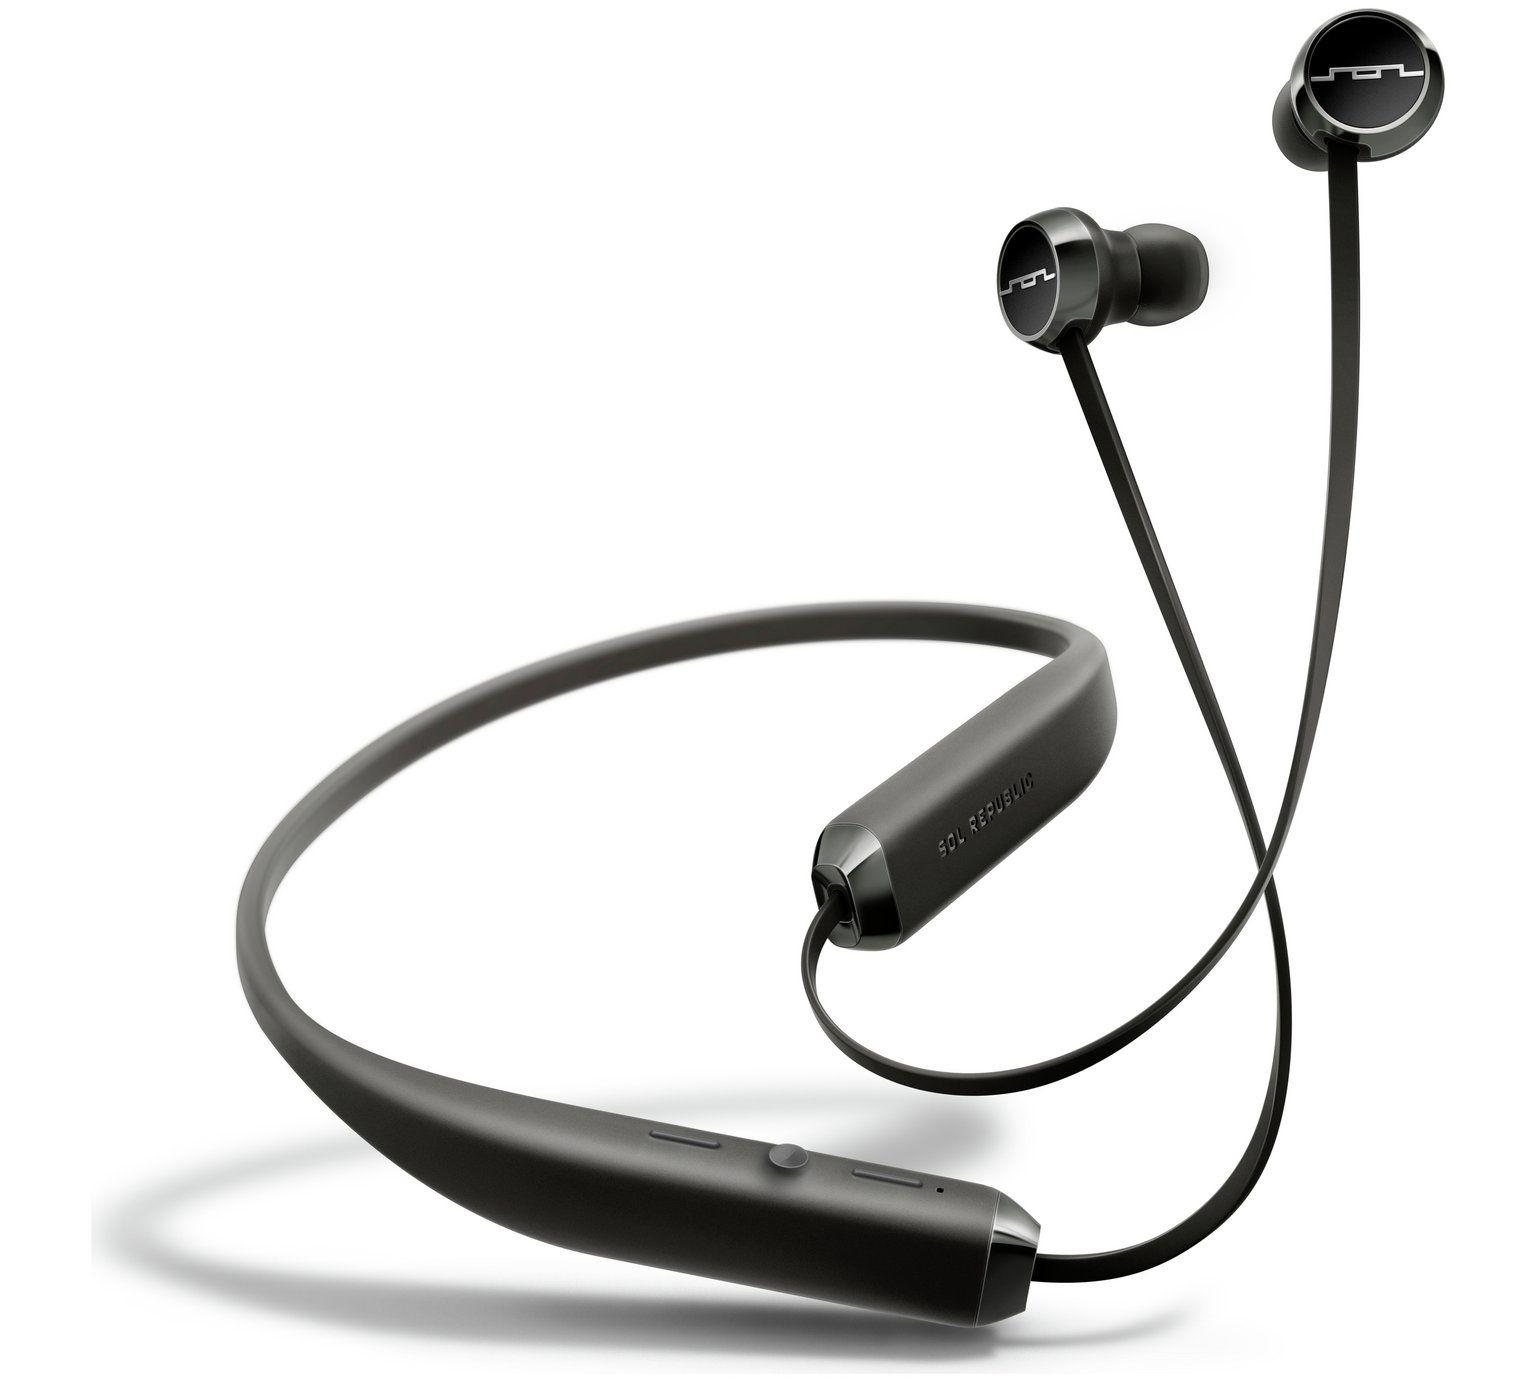 SOL Republic Shadow In - Ear Bluetooth Headphones - Black £39.99 @ argos.co.uk